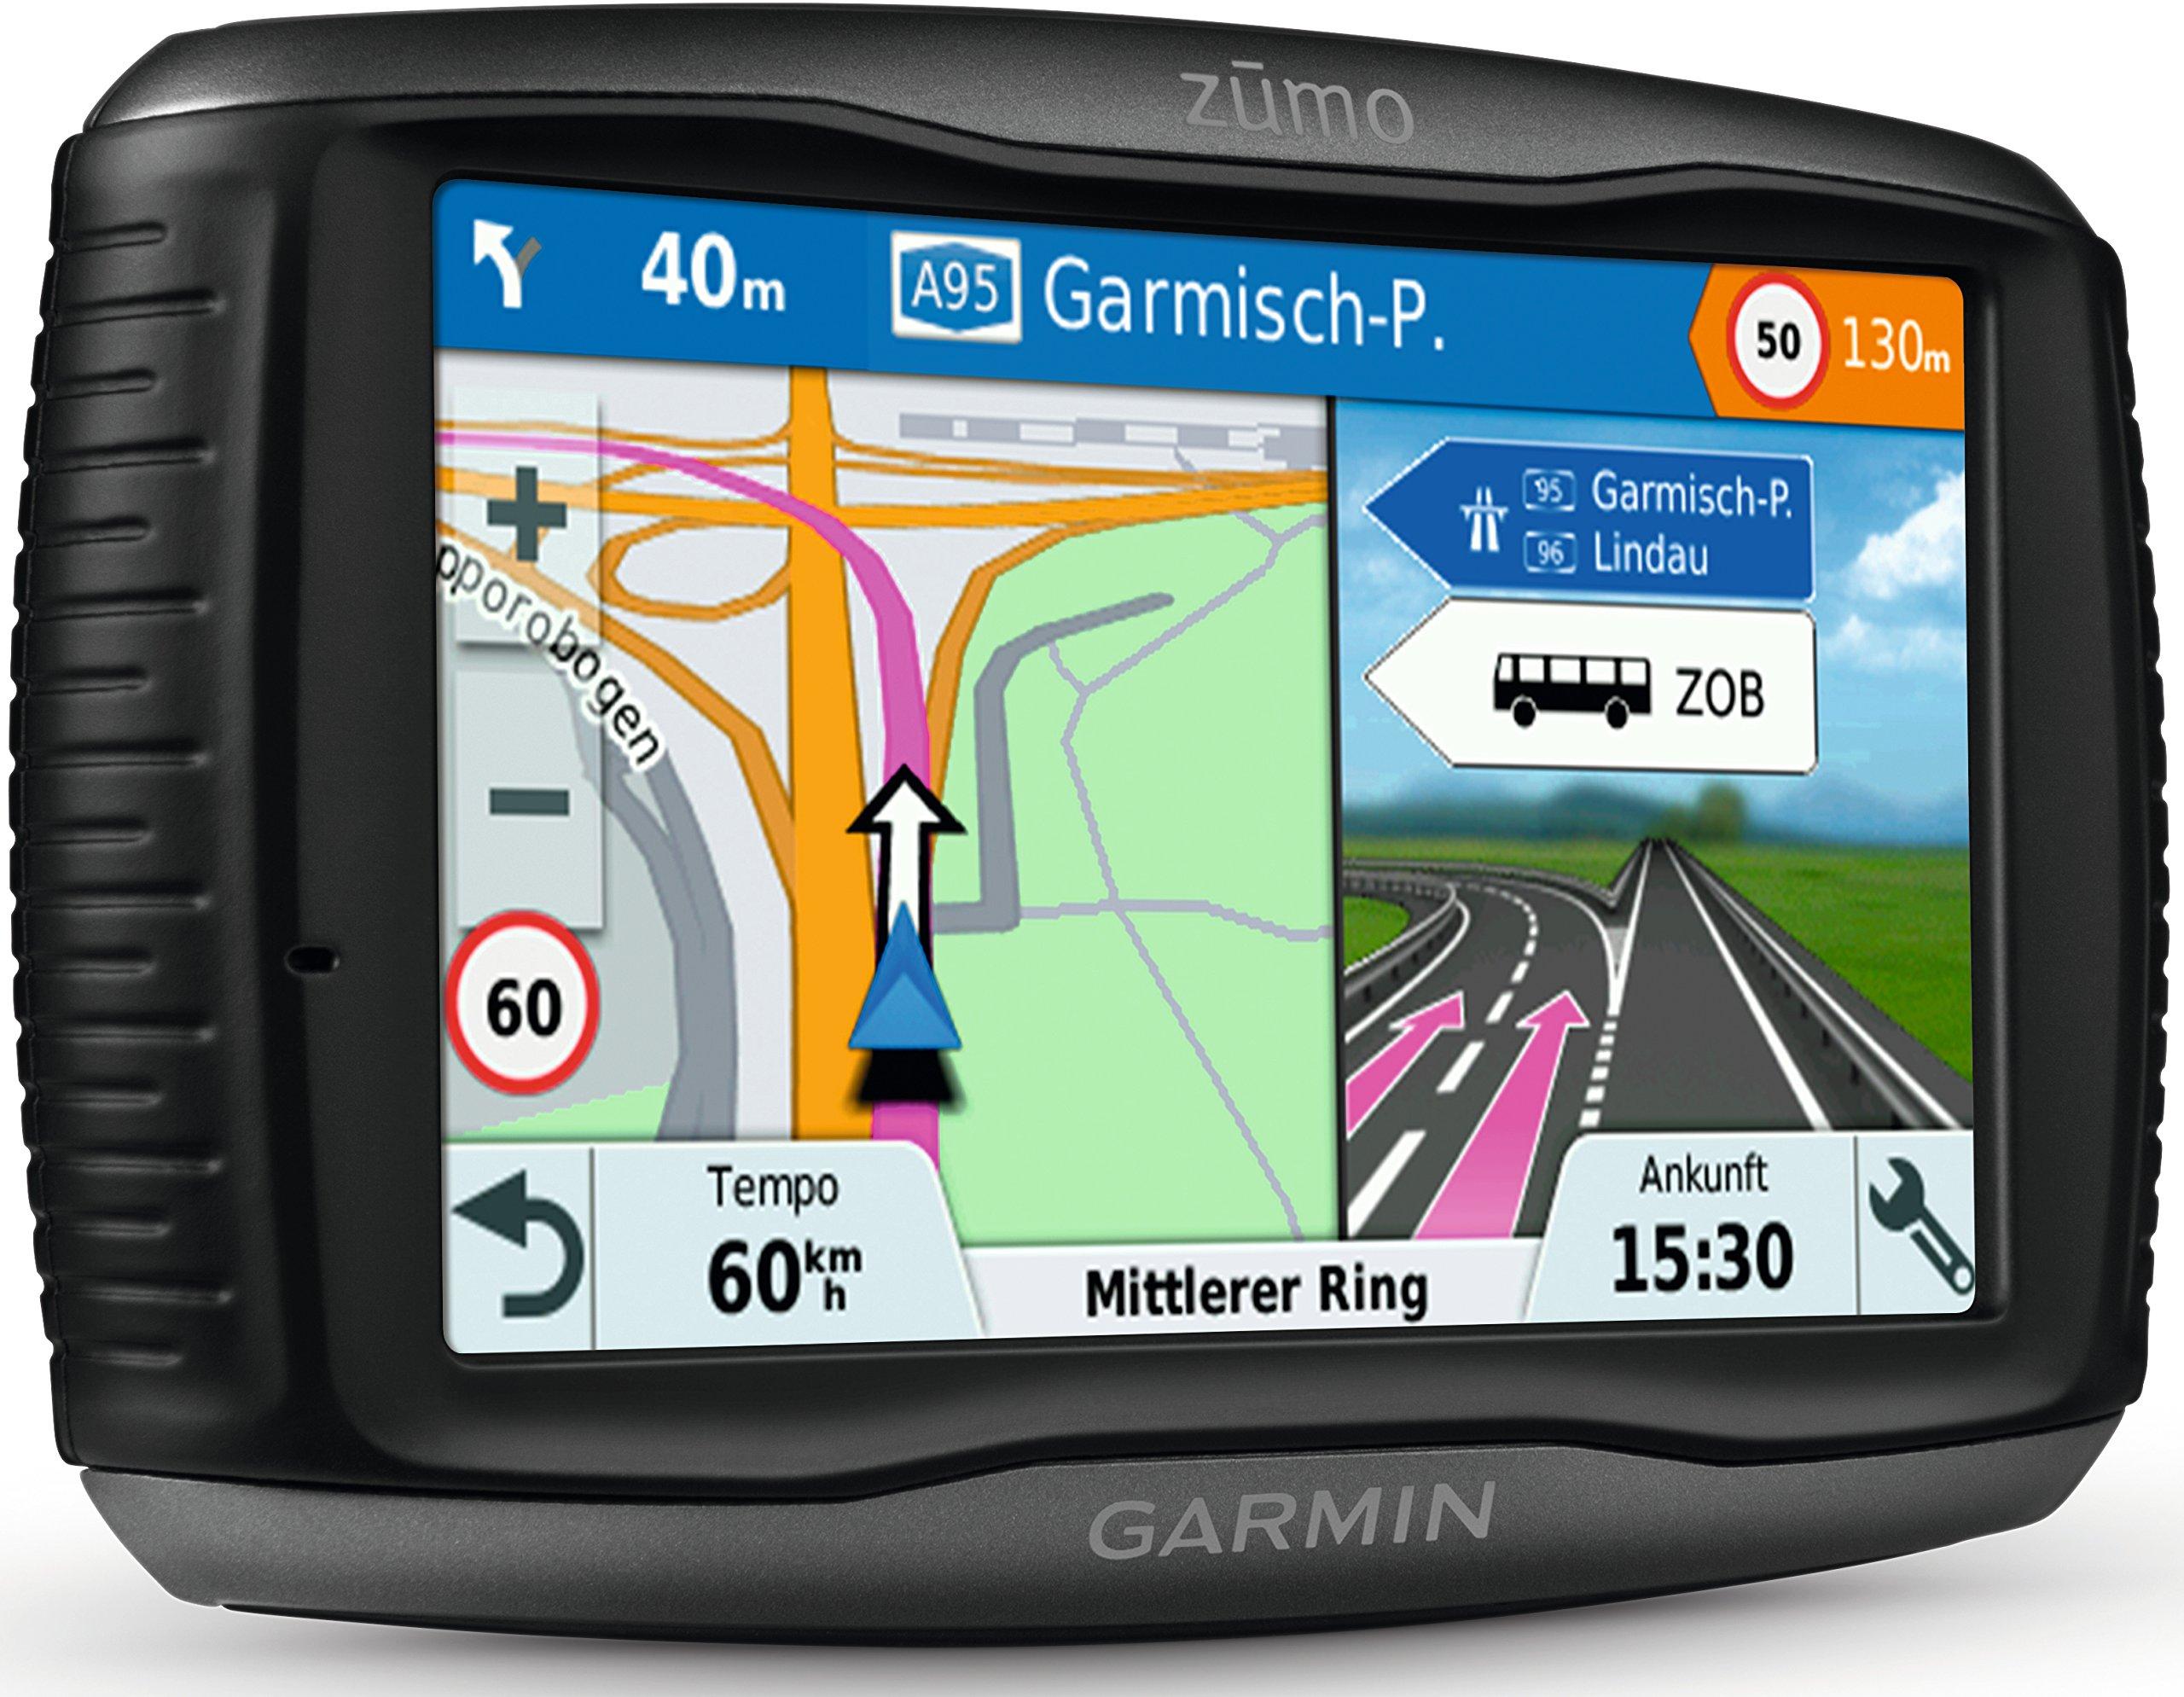 Garmin 010-01603-10 GPS Navigators, Zumo 595LM, EU